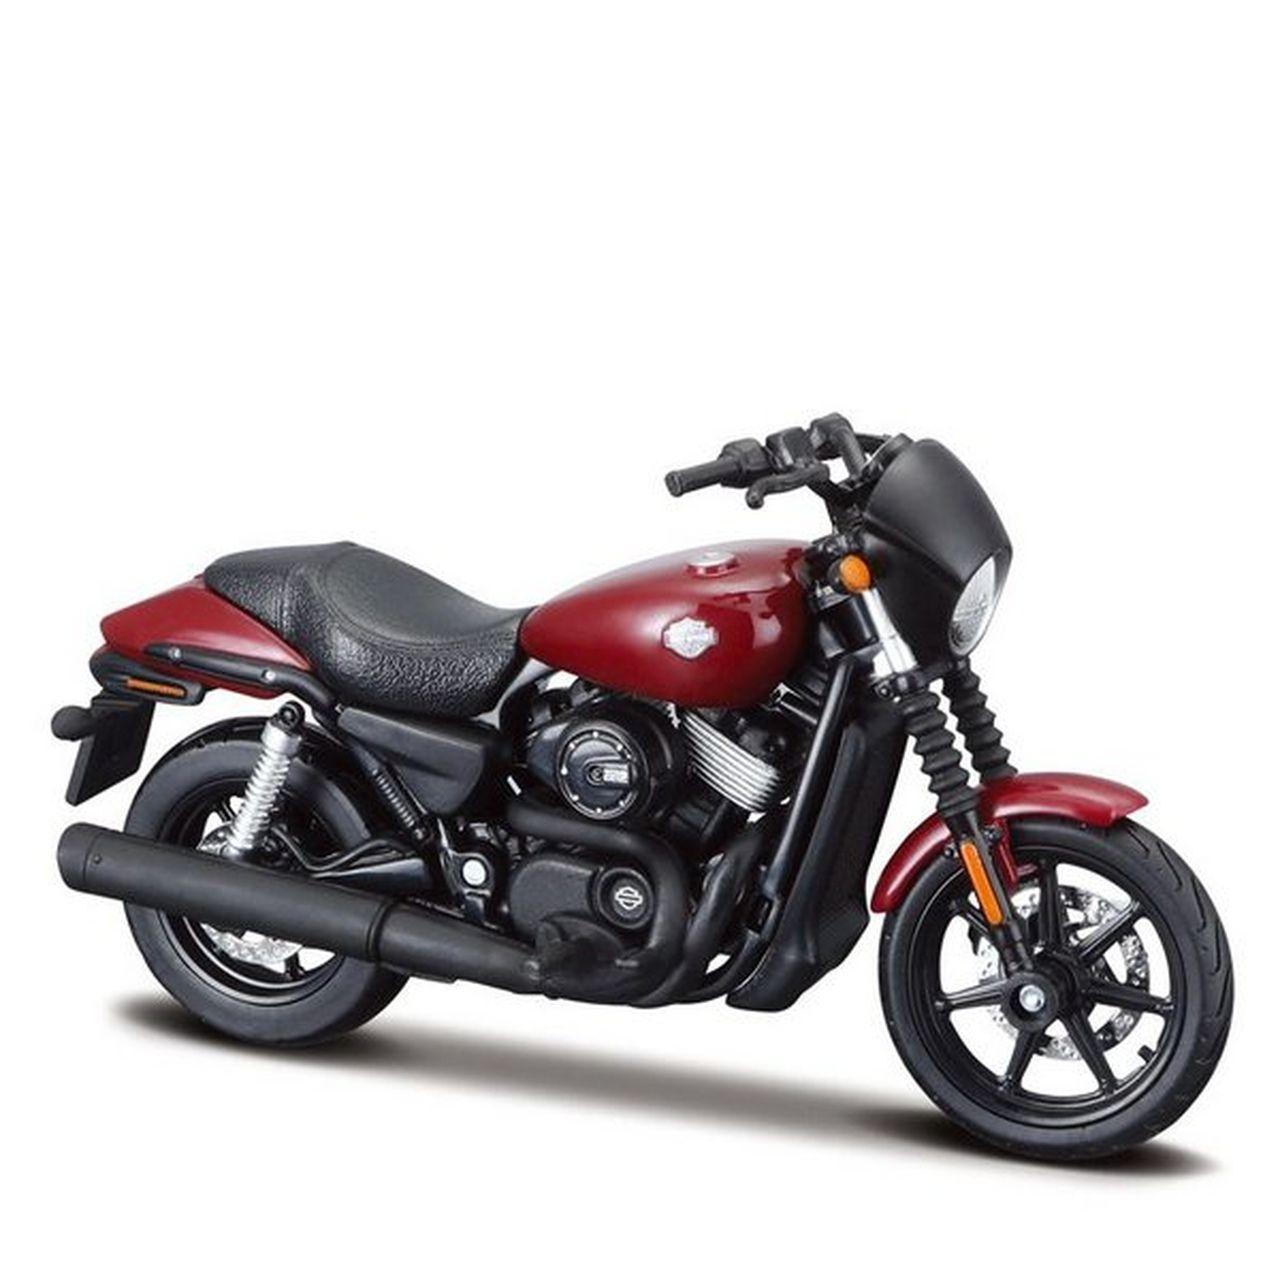 Miniatura Moto 2015 Harley Davidson Street 750 (Vinho): Harley Davidson (Serie 36) Escala 1/18 - Maisco